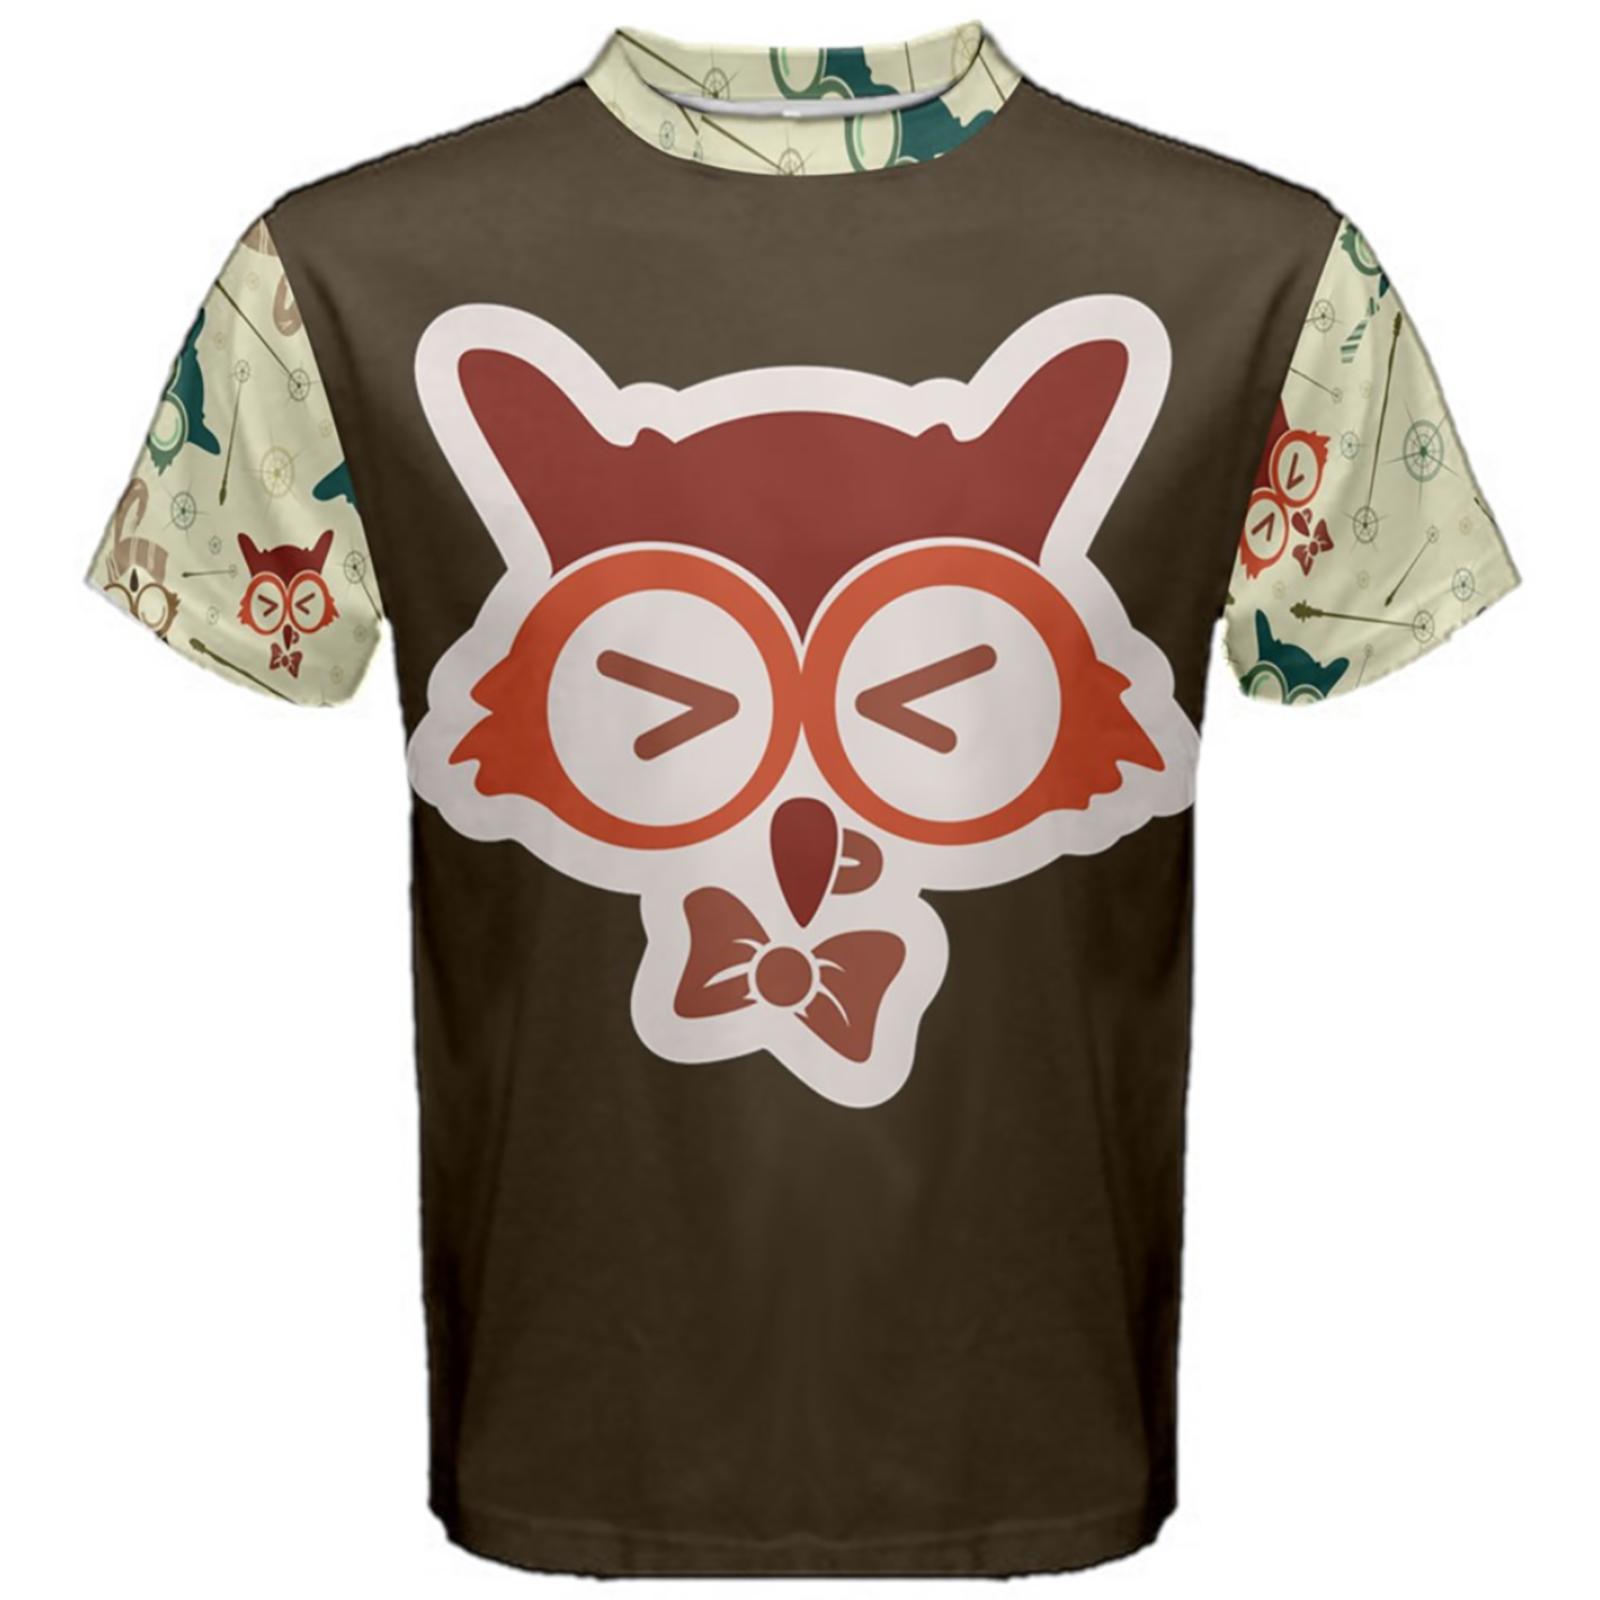 Vintage Emoji Owl Cotton Tee (Red Emoji Owl)